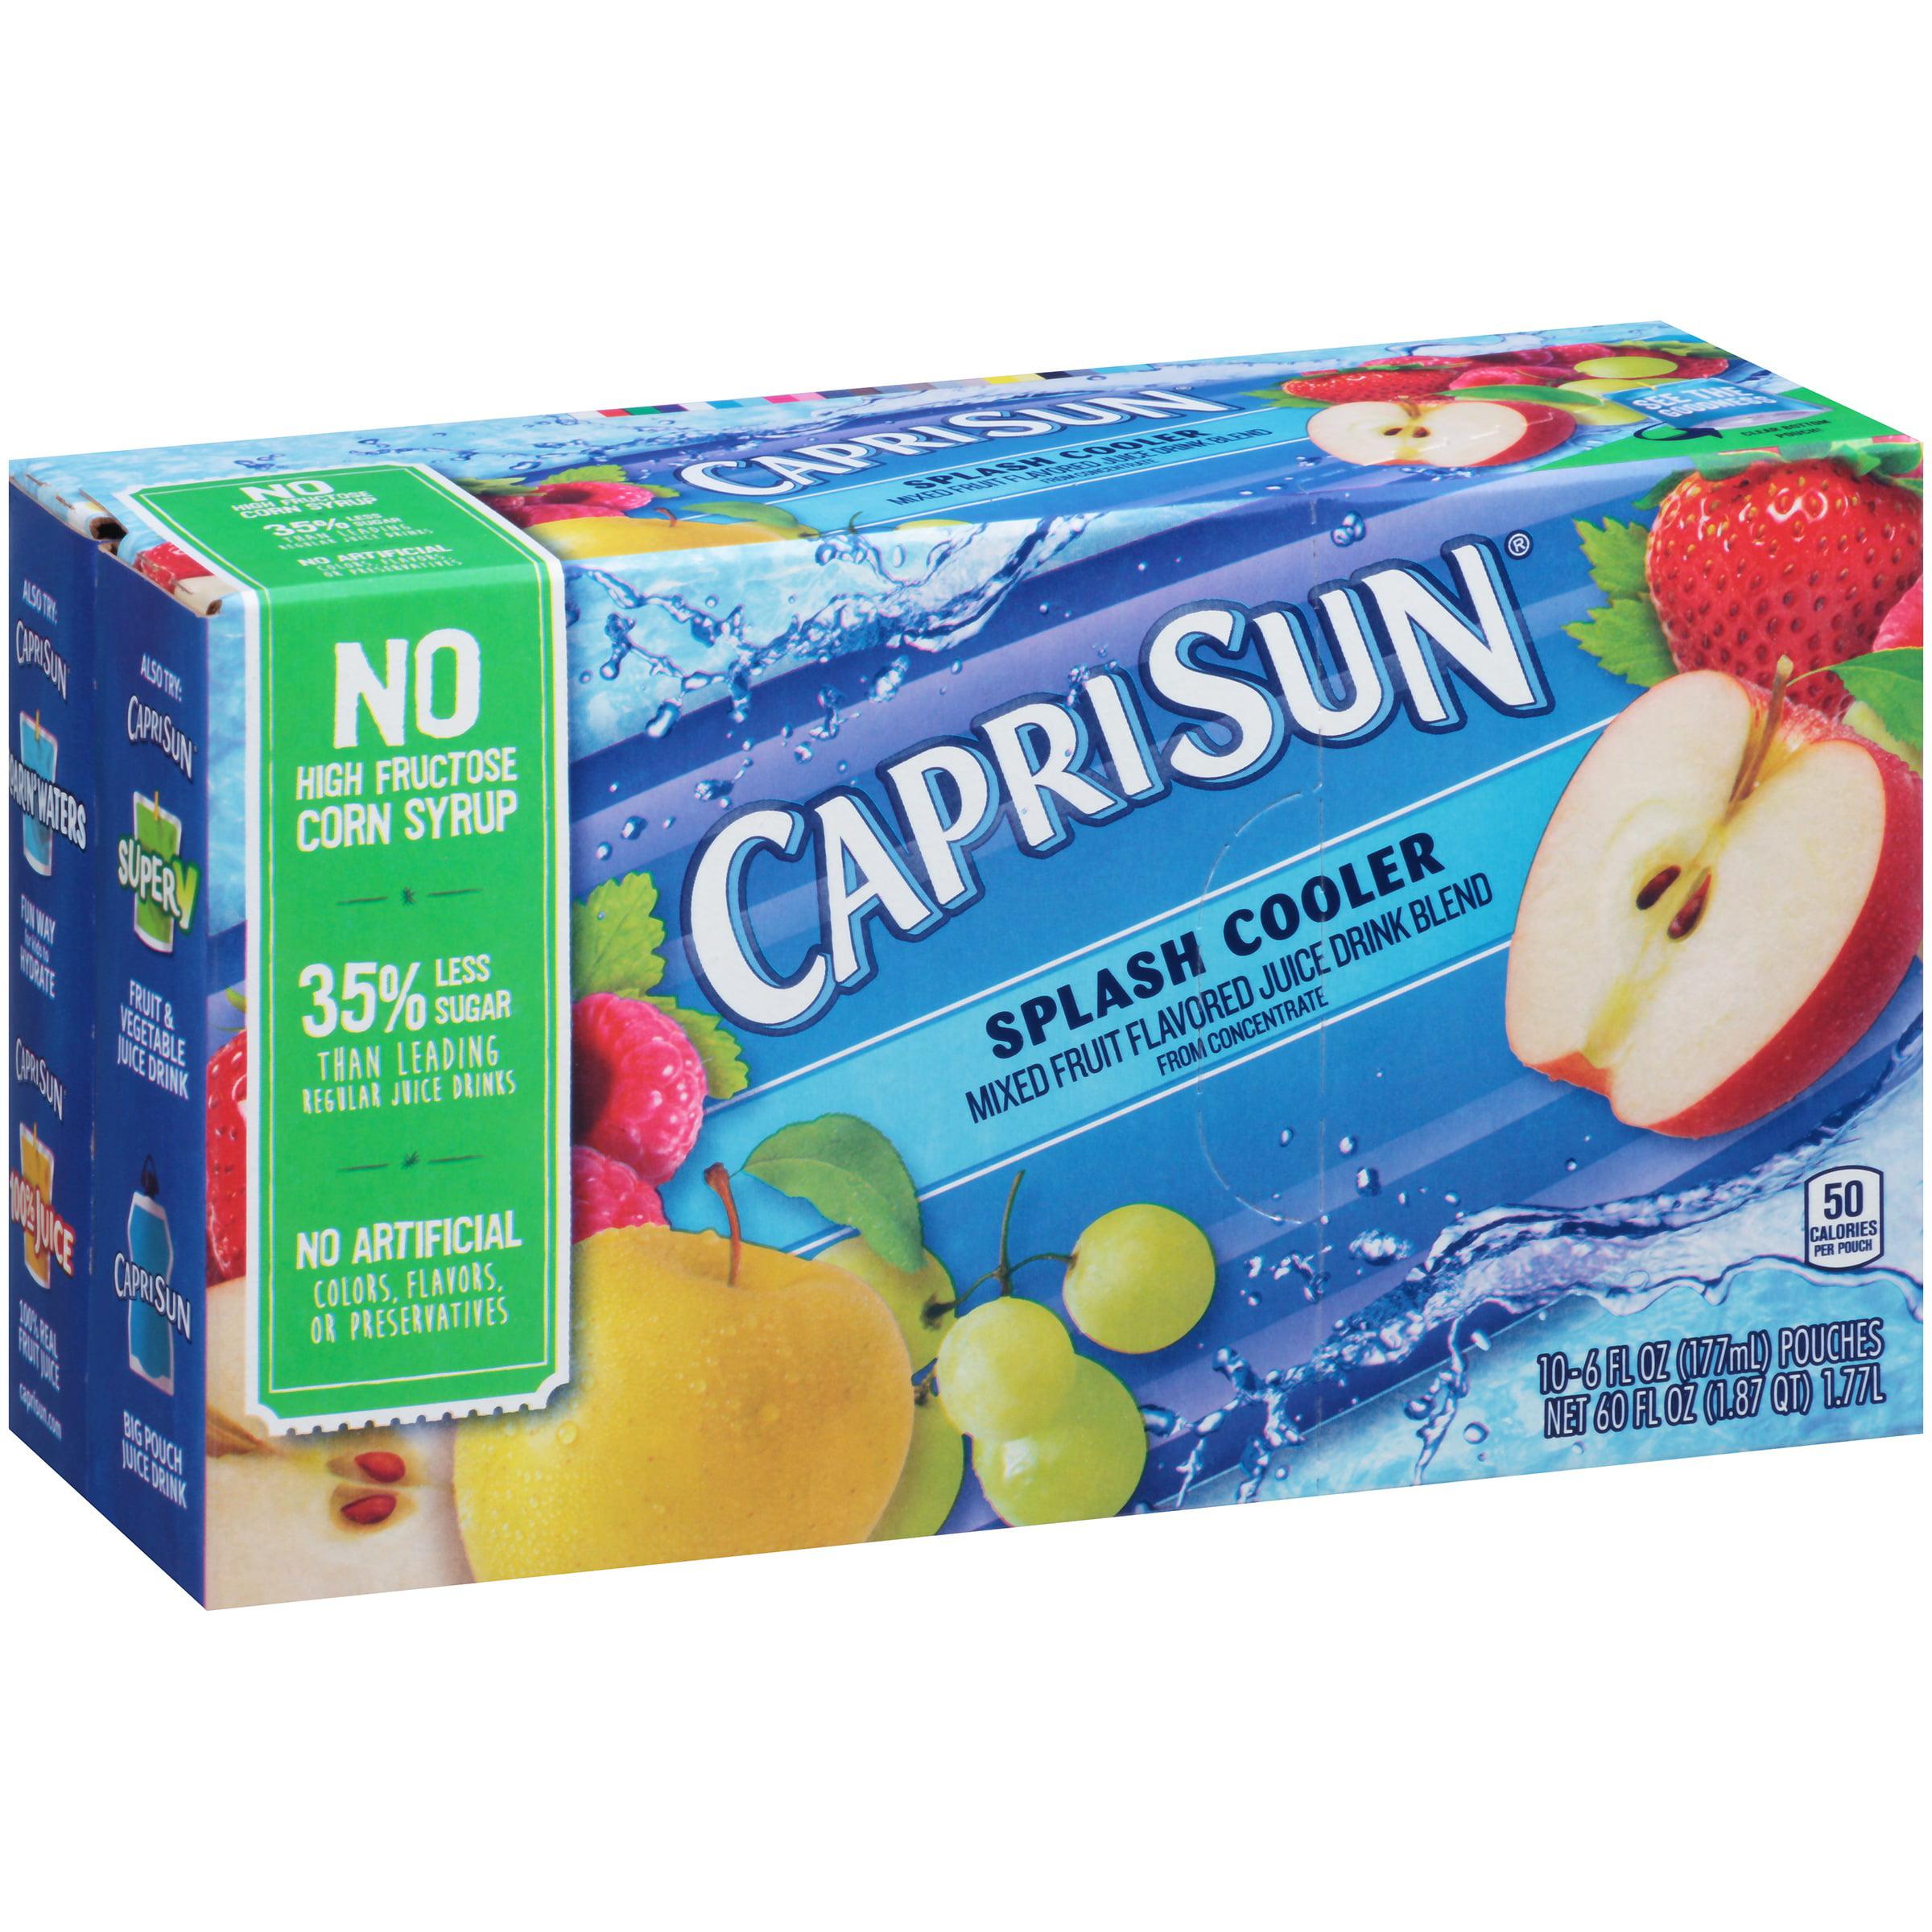 Capri Sun Splash Cooler Ready-to-Drink Soft Drink, 10 - 6 fl oz Pouches